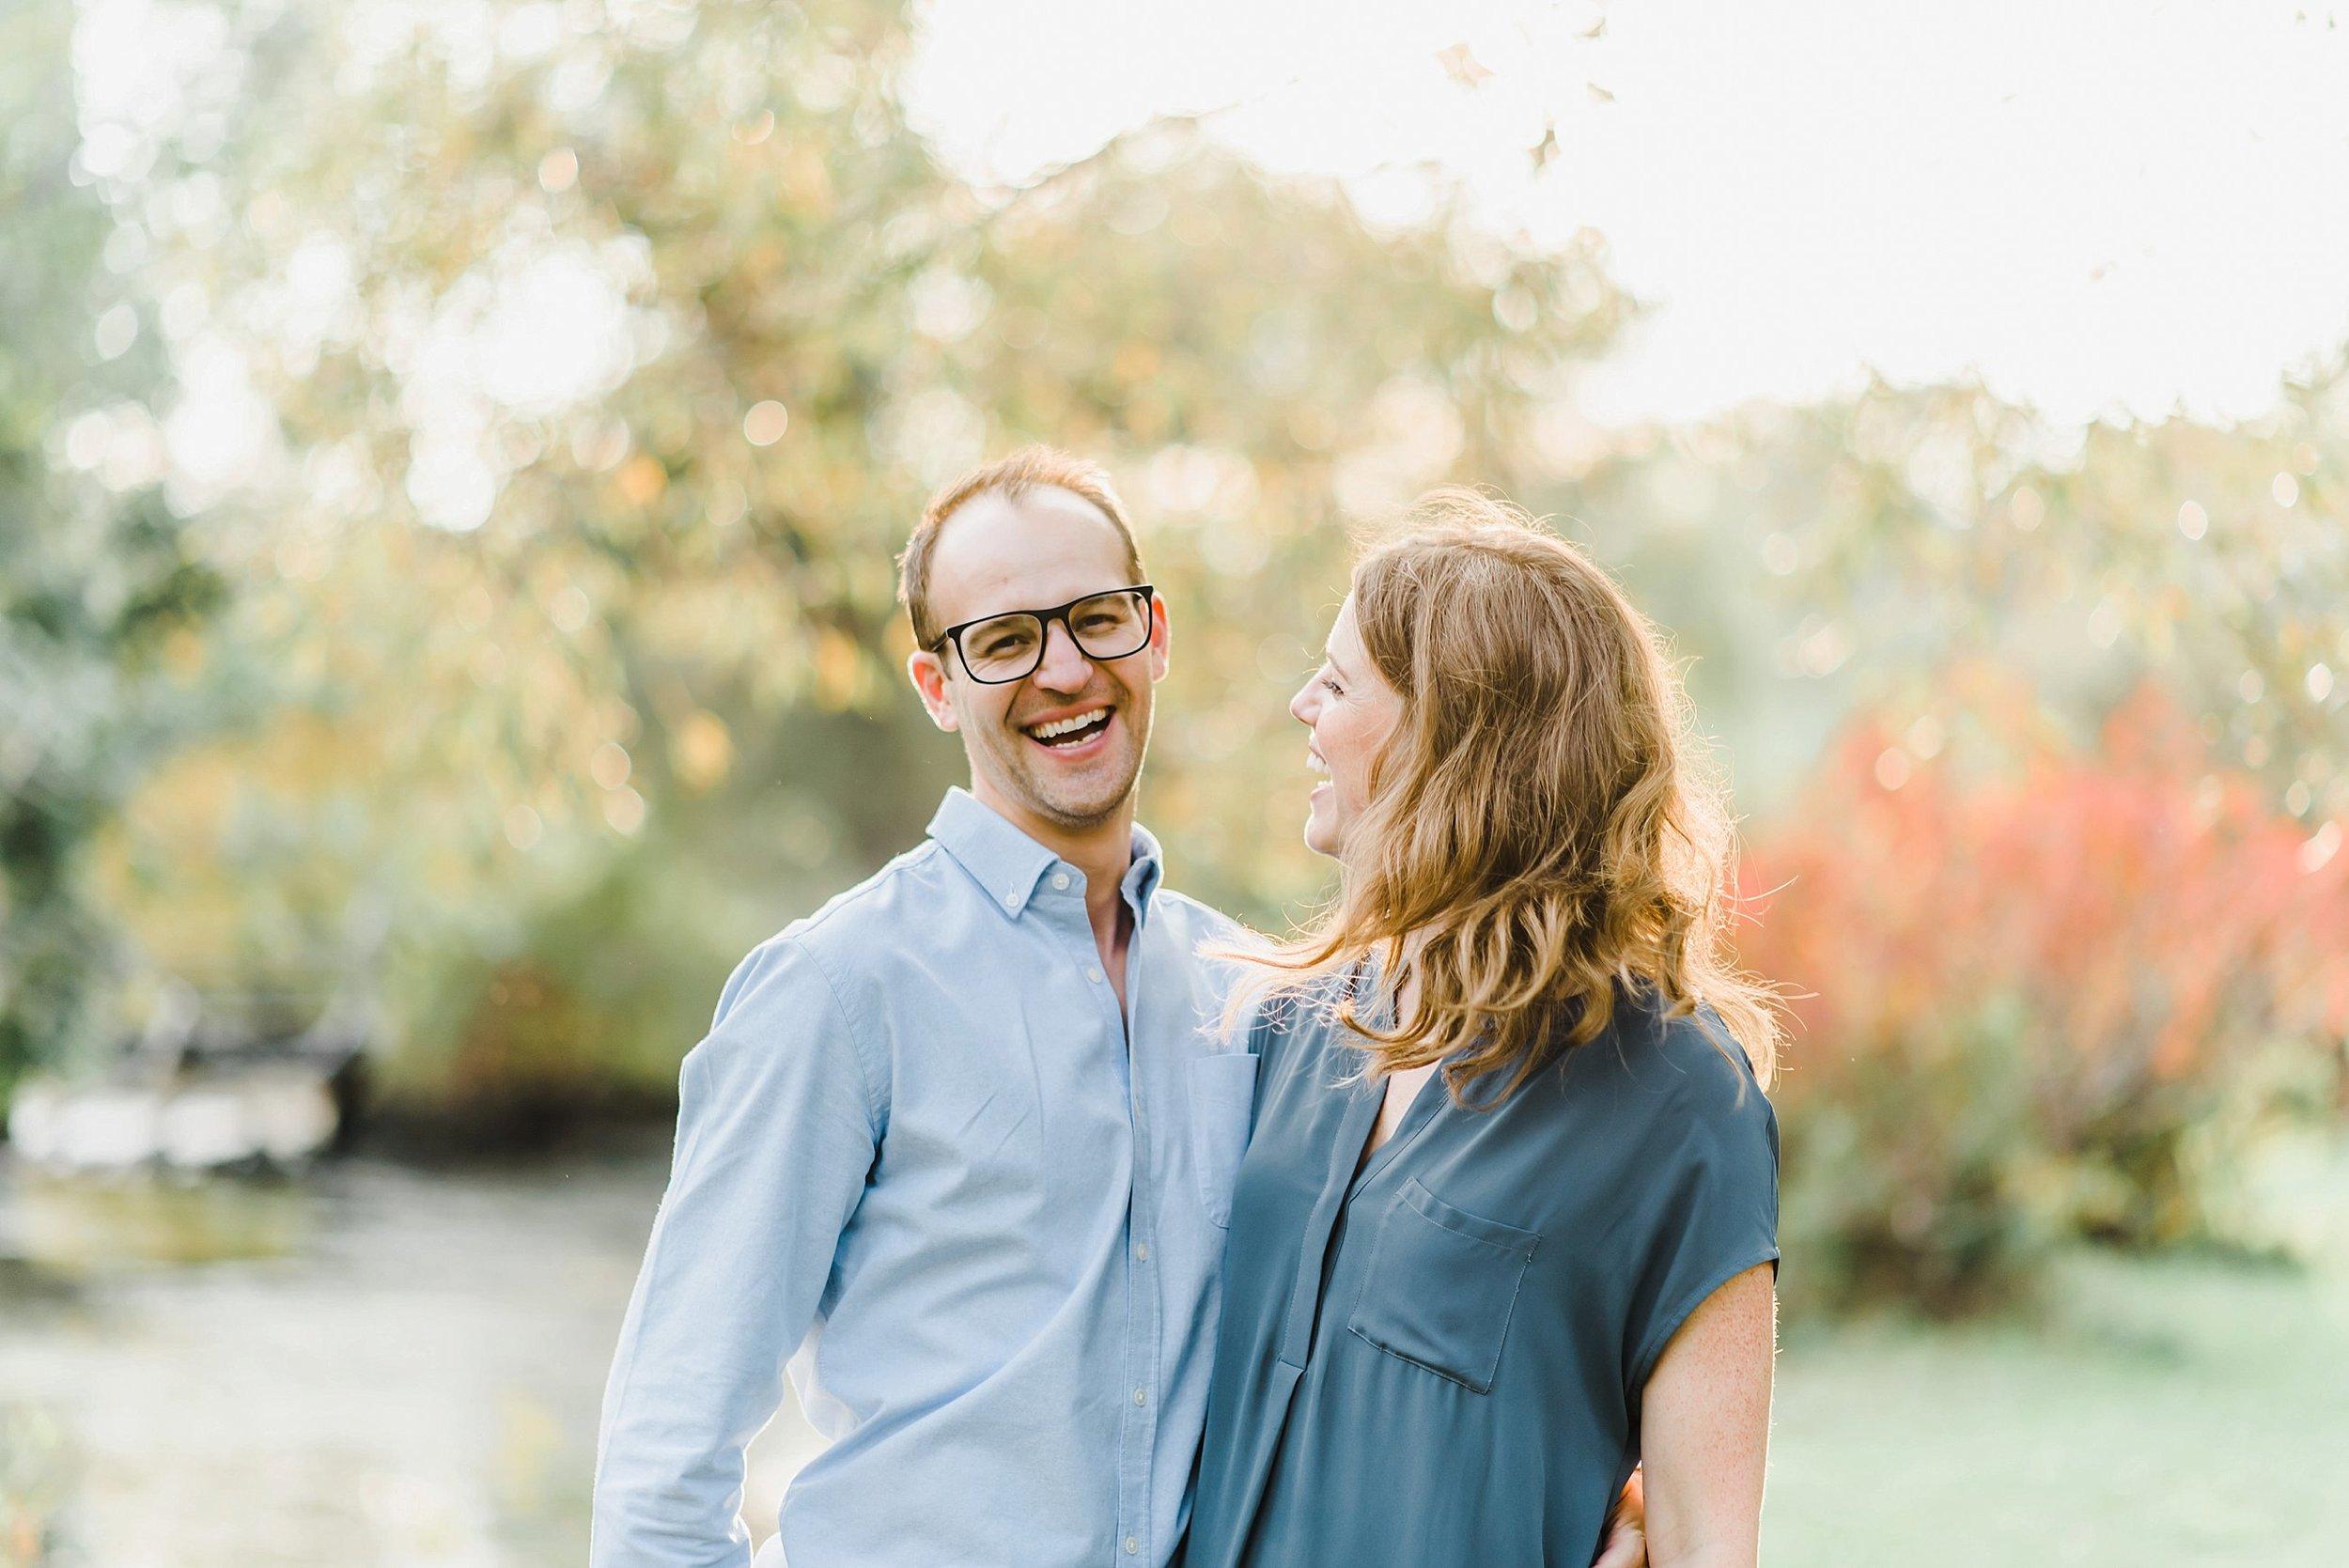 light airy indie fine art ottawa wedding photographer | Ali and Batoul Photography_1426.jpg